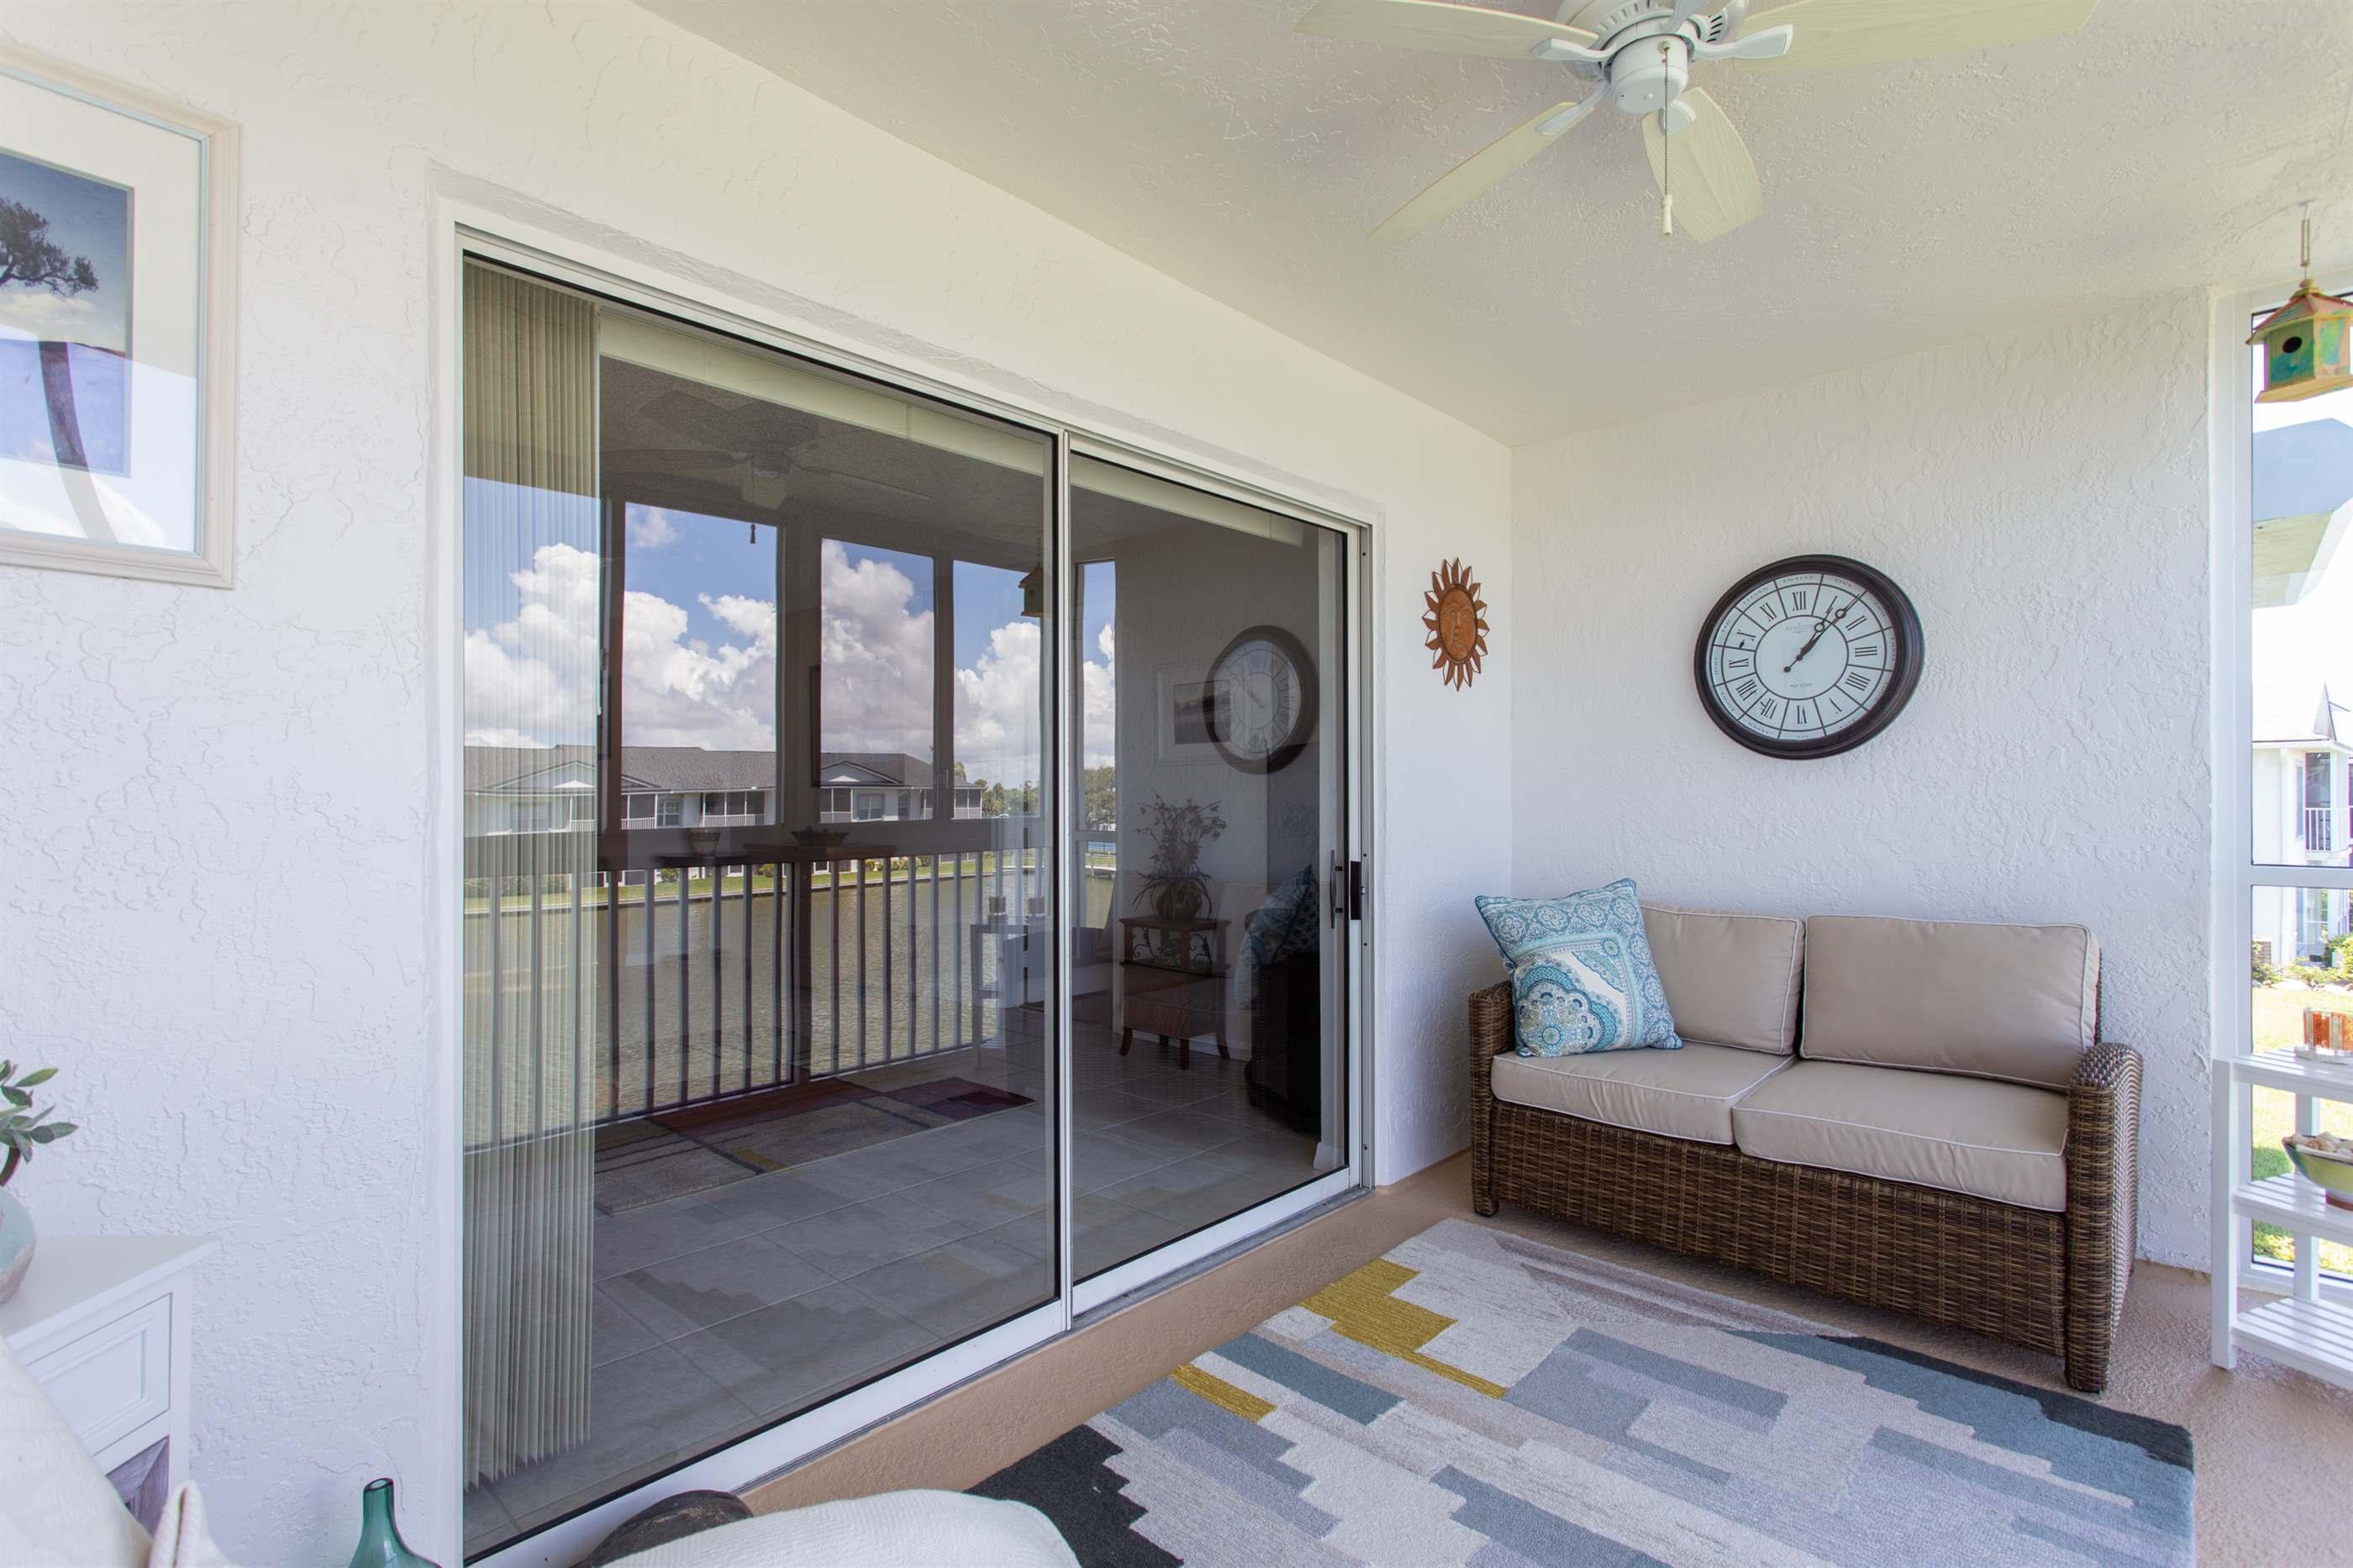 560 S Brevard Ave APT 622, Cocoa Beach, FL 32931